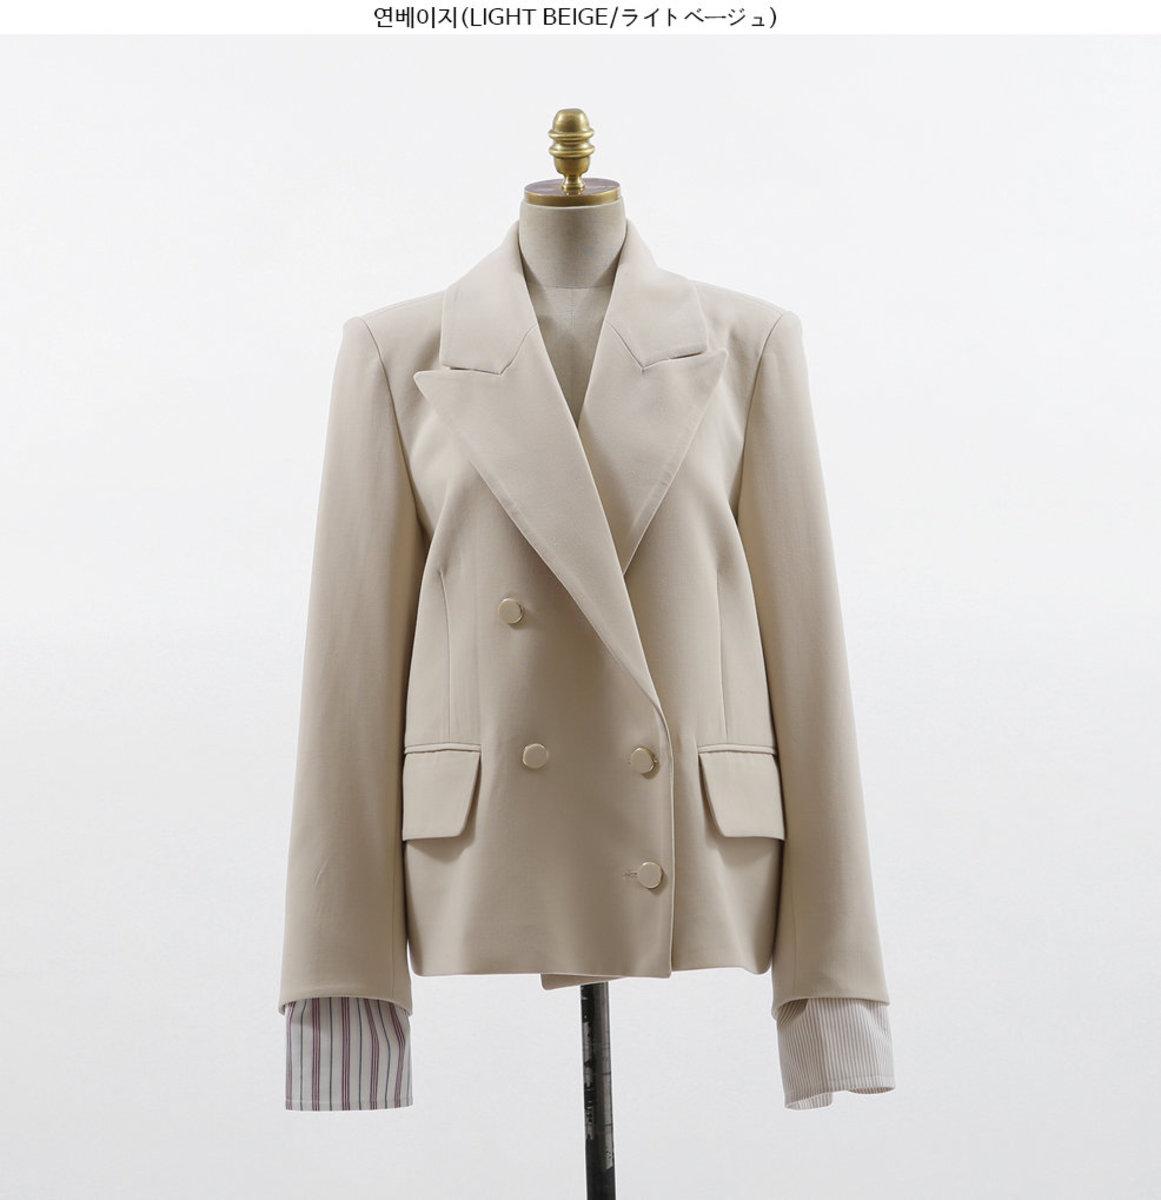 Peak Lapel Contrast Cuff Jacket